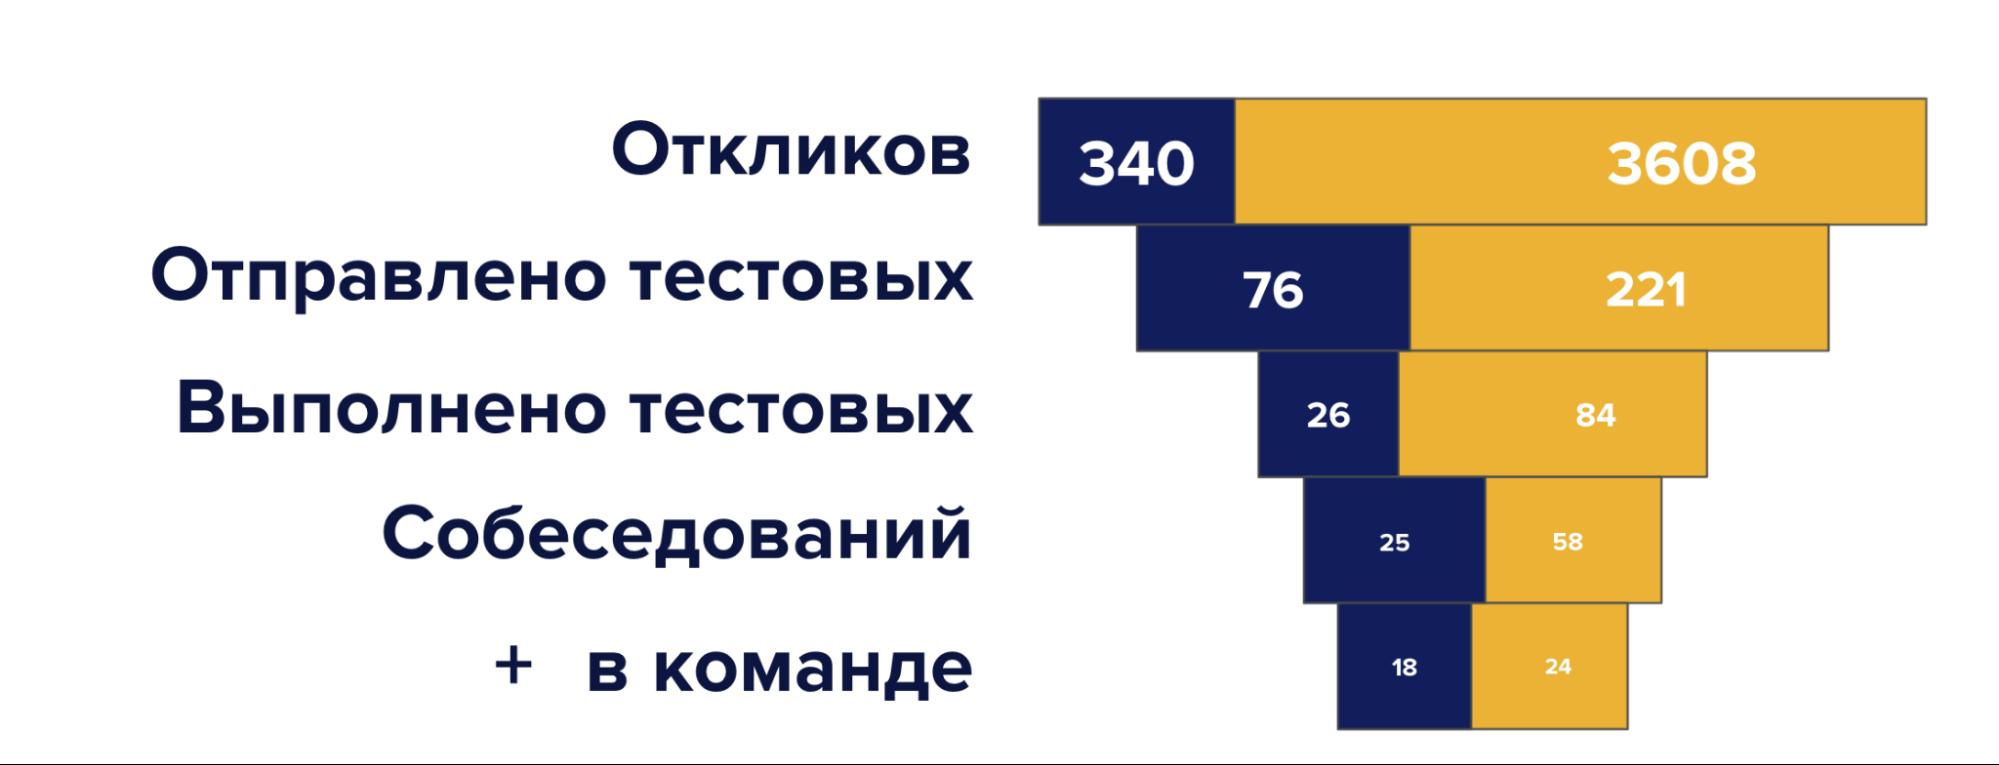 воронка найма Email Soldiers впервом периоде OKR-2021